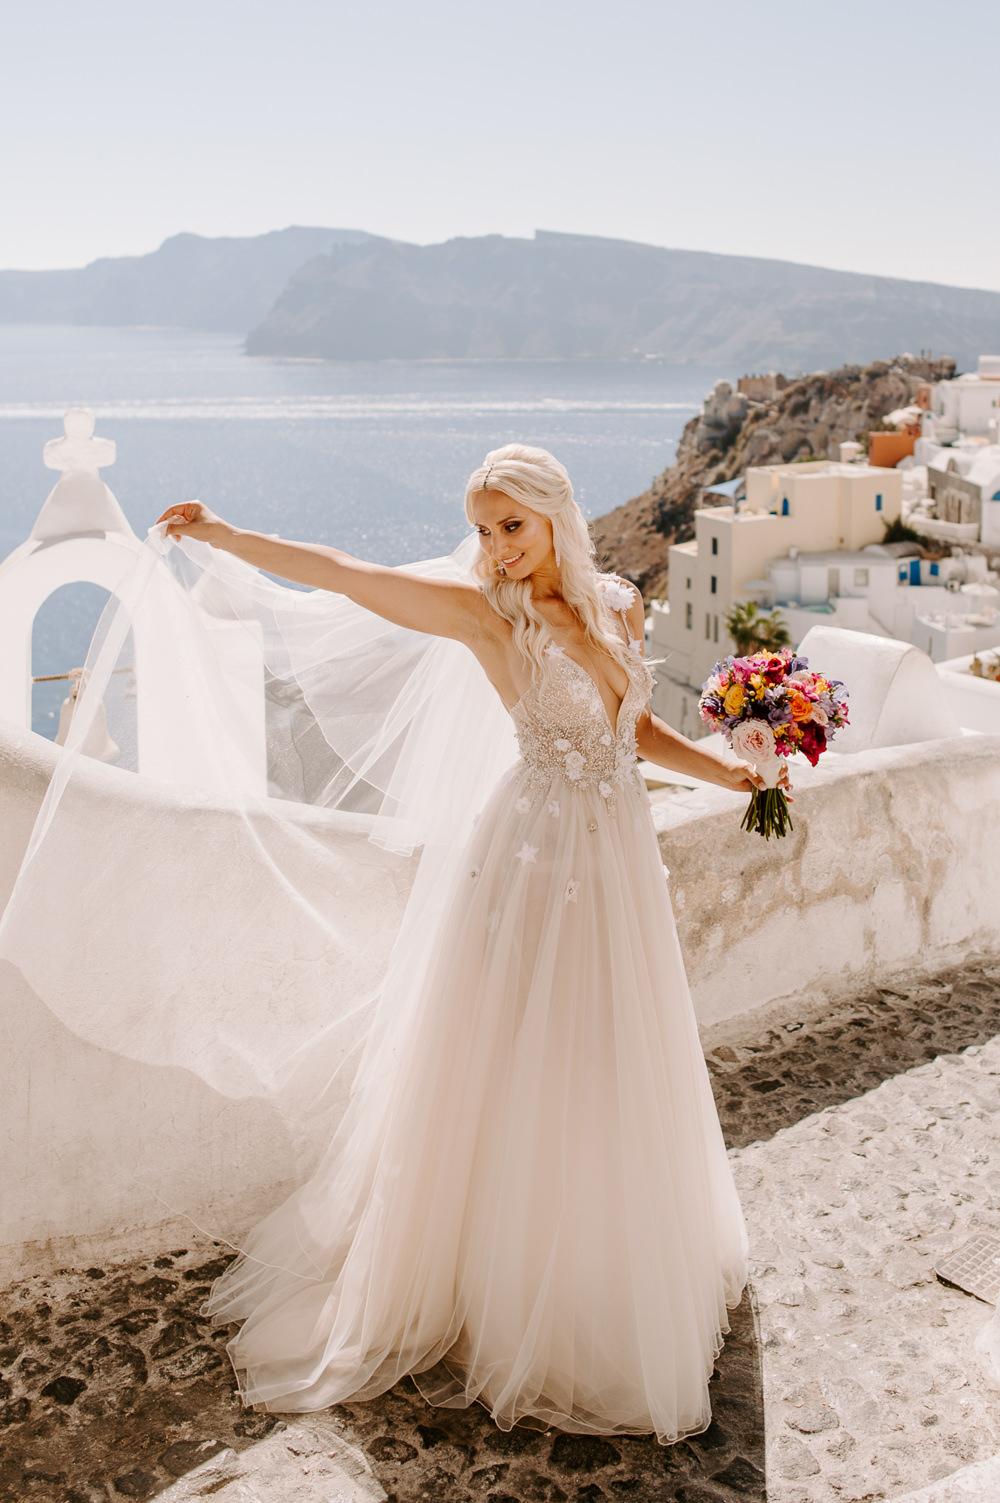 Bride Bridal Dress Gown Muse by Berta Lace Tulle Veil Santorini Wedding Phosart Photography